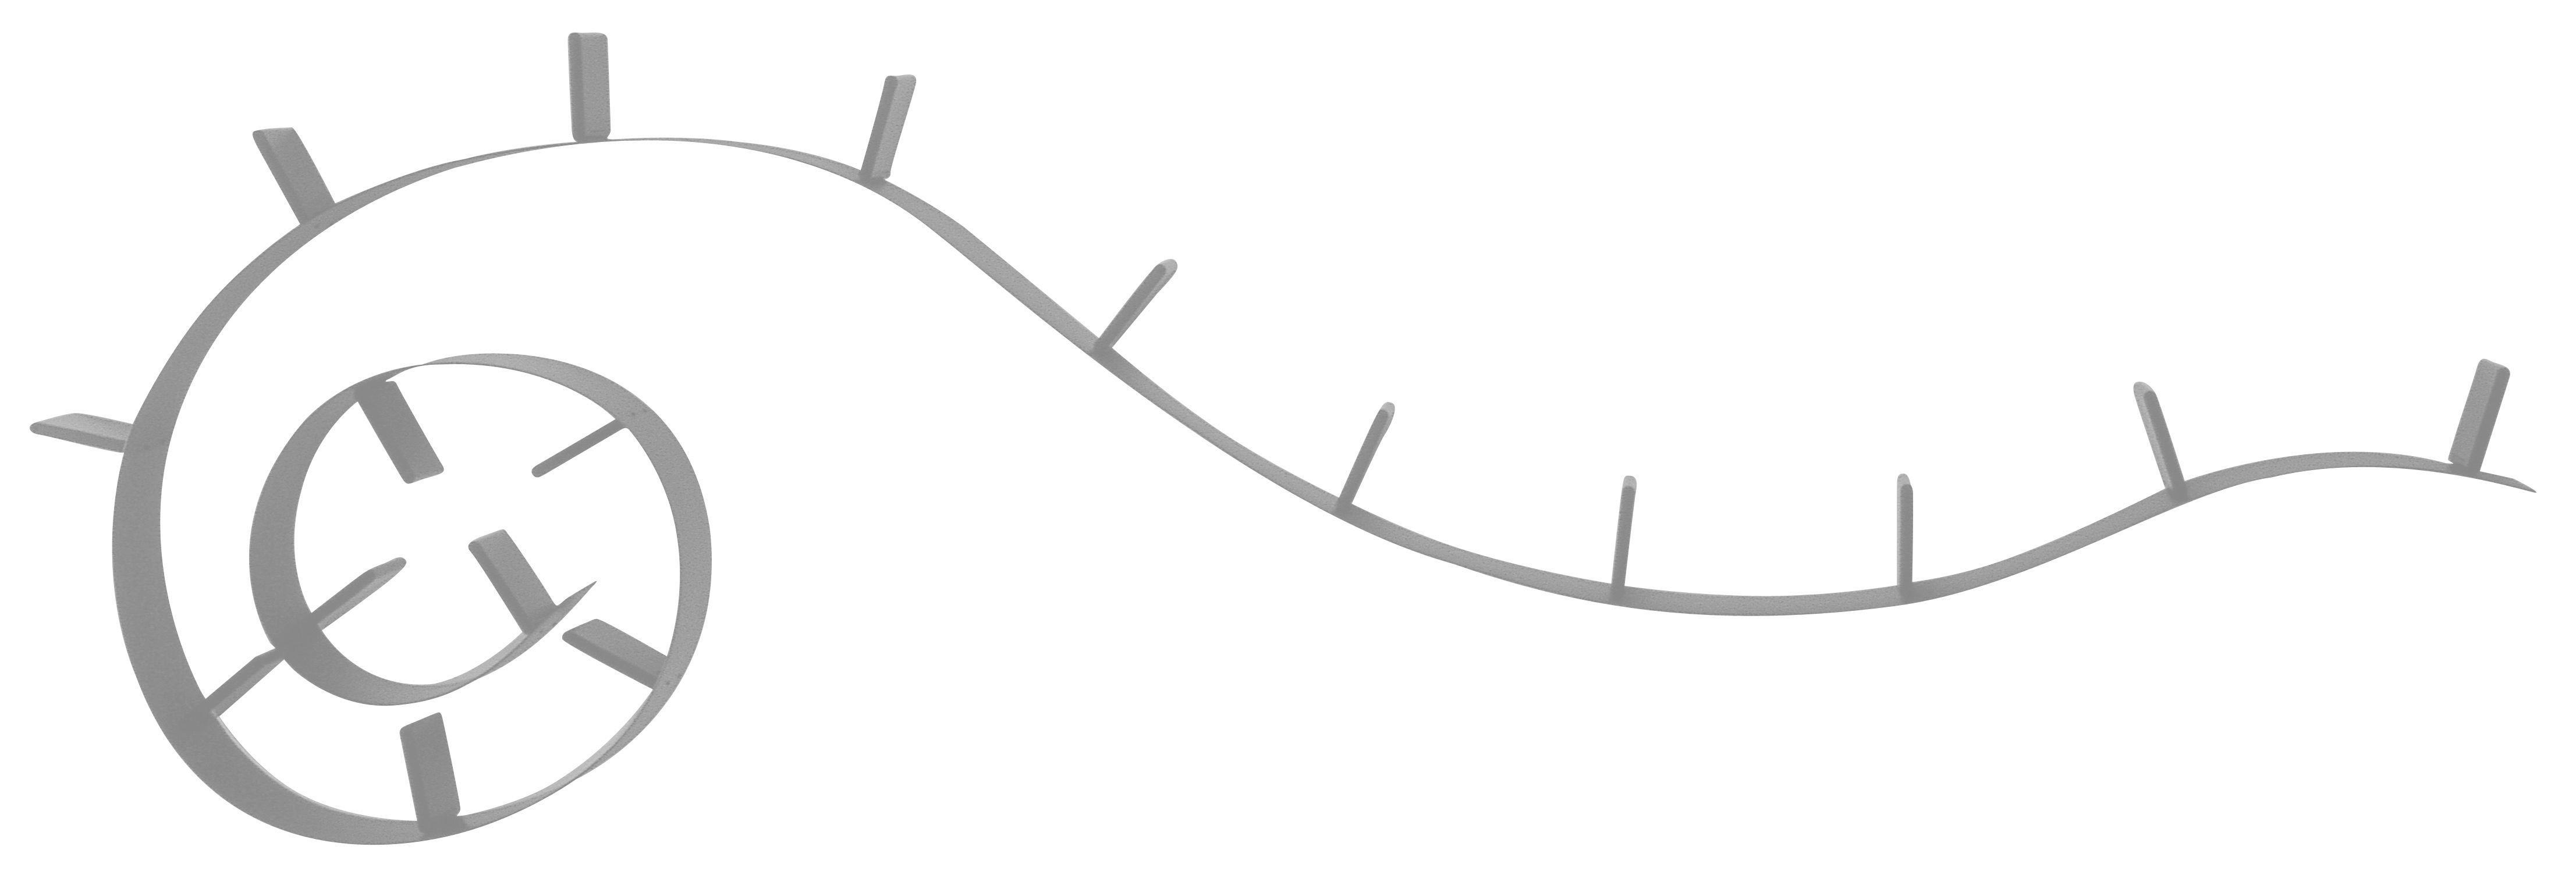 Möbel - Regale und Bücherregale - Bookworm Regal - Kartell - Aluminium - PVC